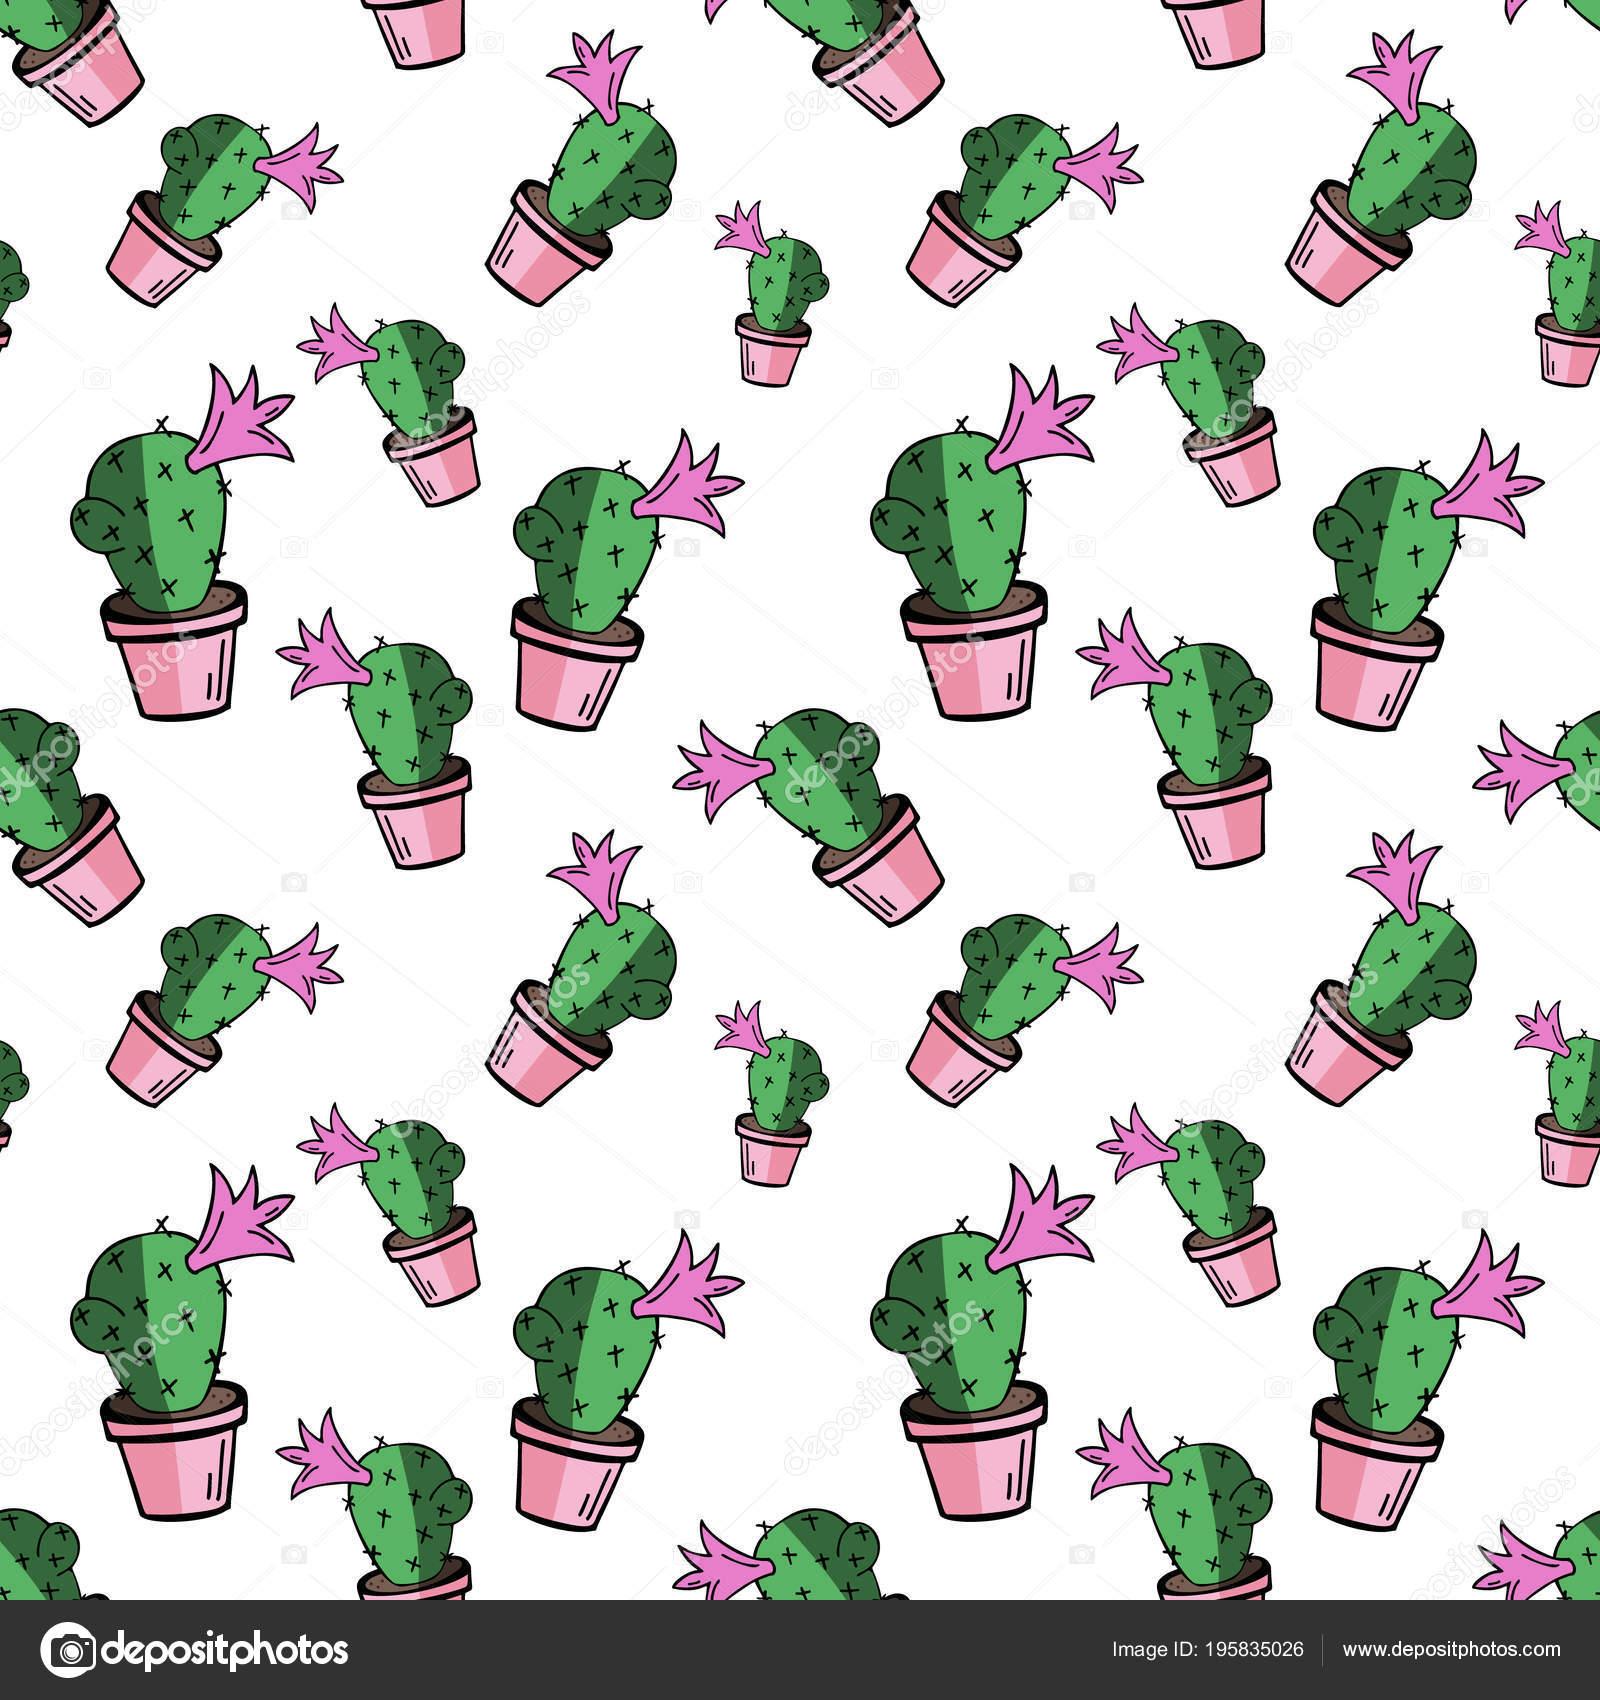 Dibujos Doodle Floral Png Cactus Verde Inicio Flor Maceta Rosa